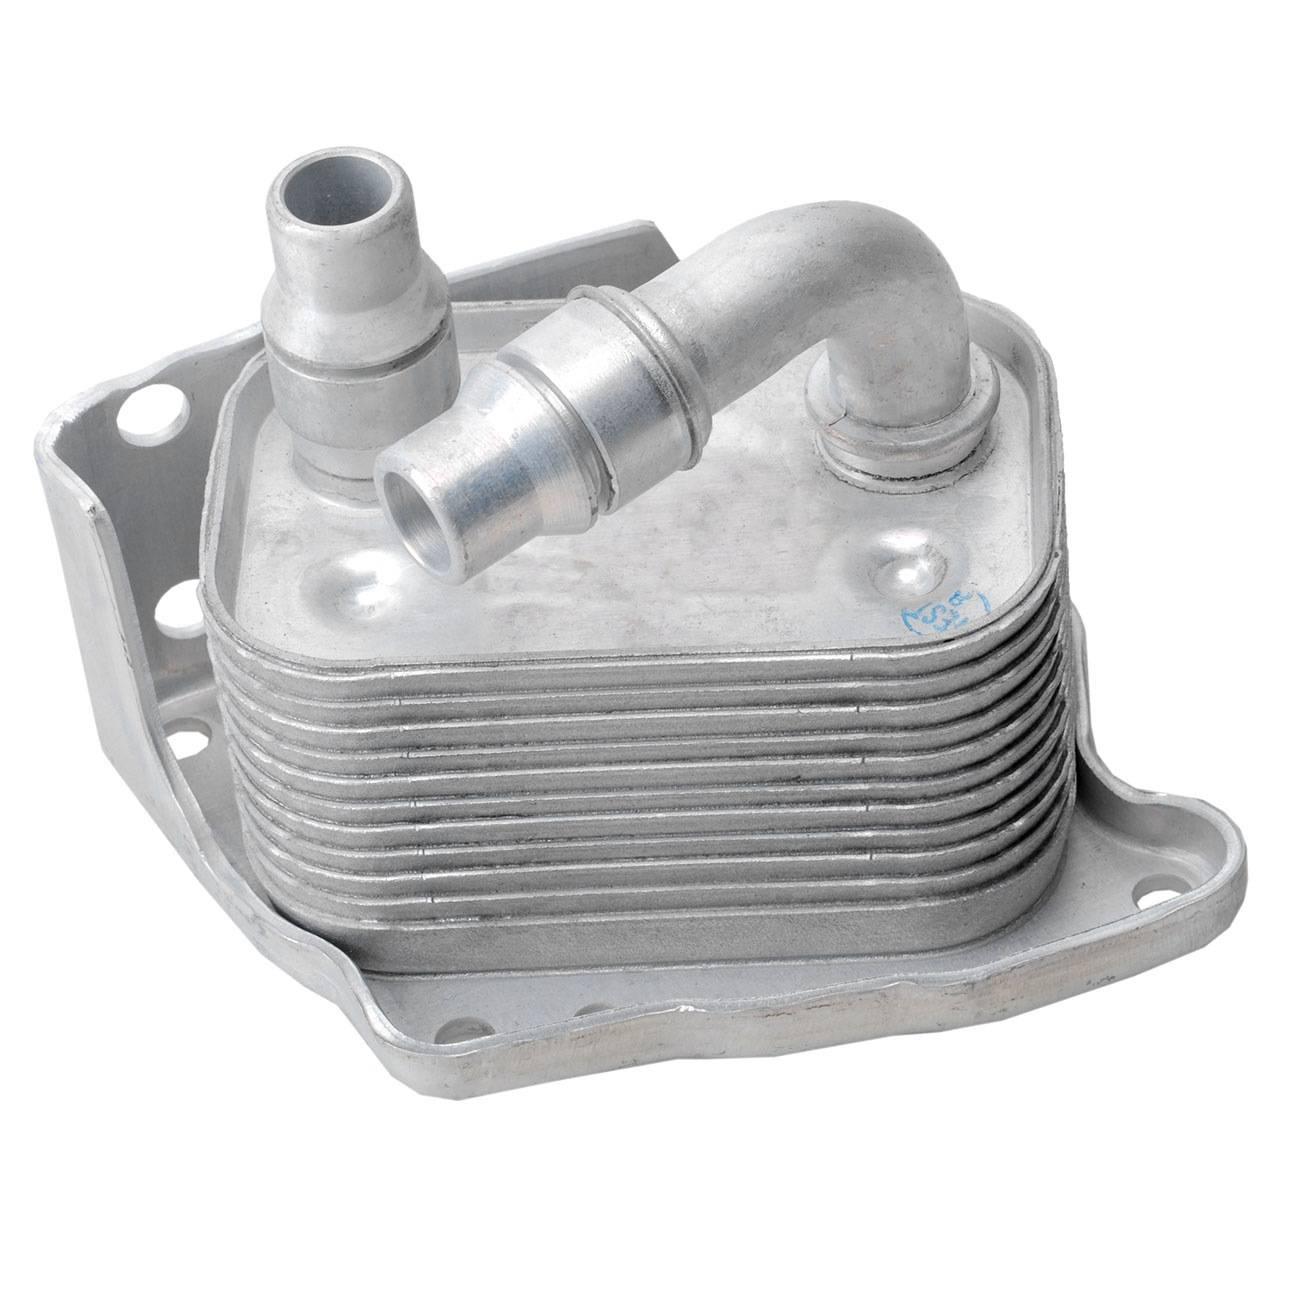 Bapmic 11427508967 Engine Oil Cooler Heater Exchanger for BMW E46 E60 E81 E87 E90 X3 E83 Z4 E85